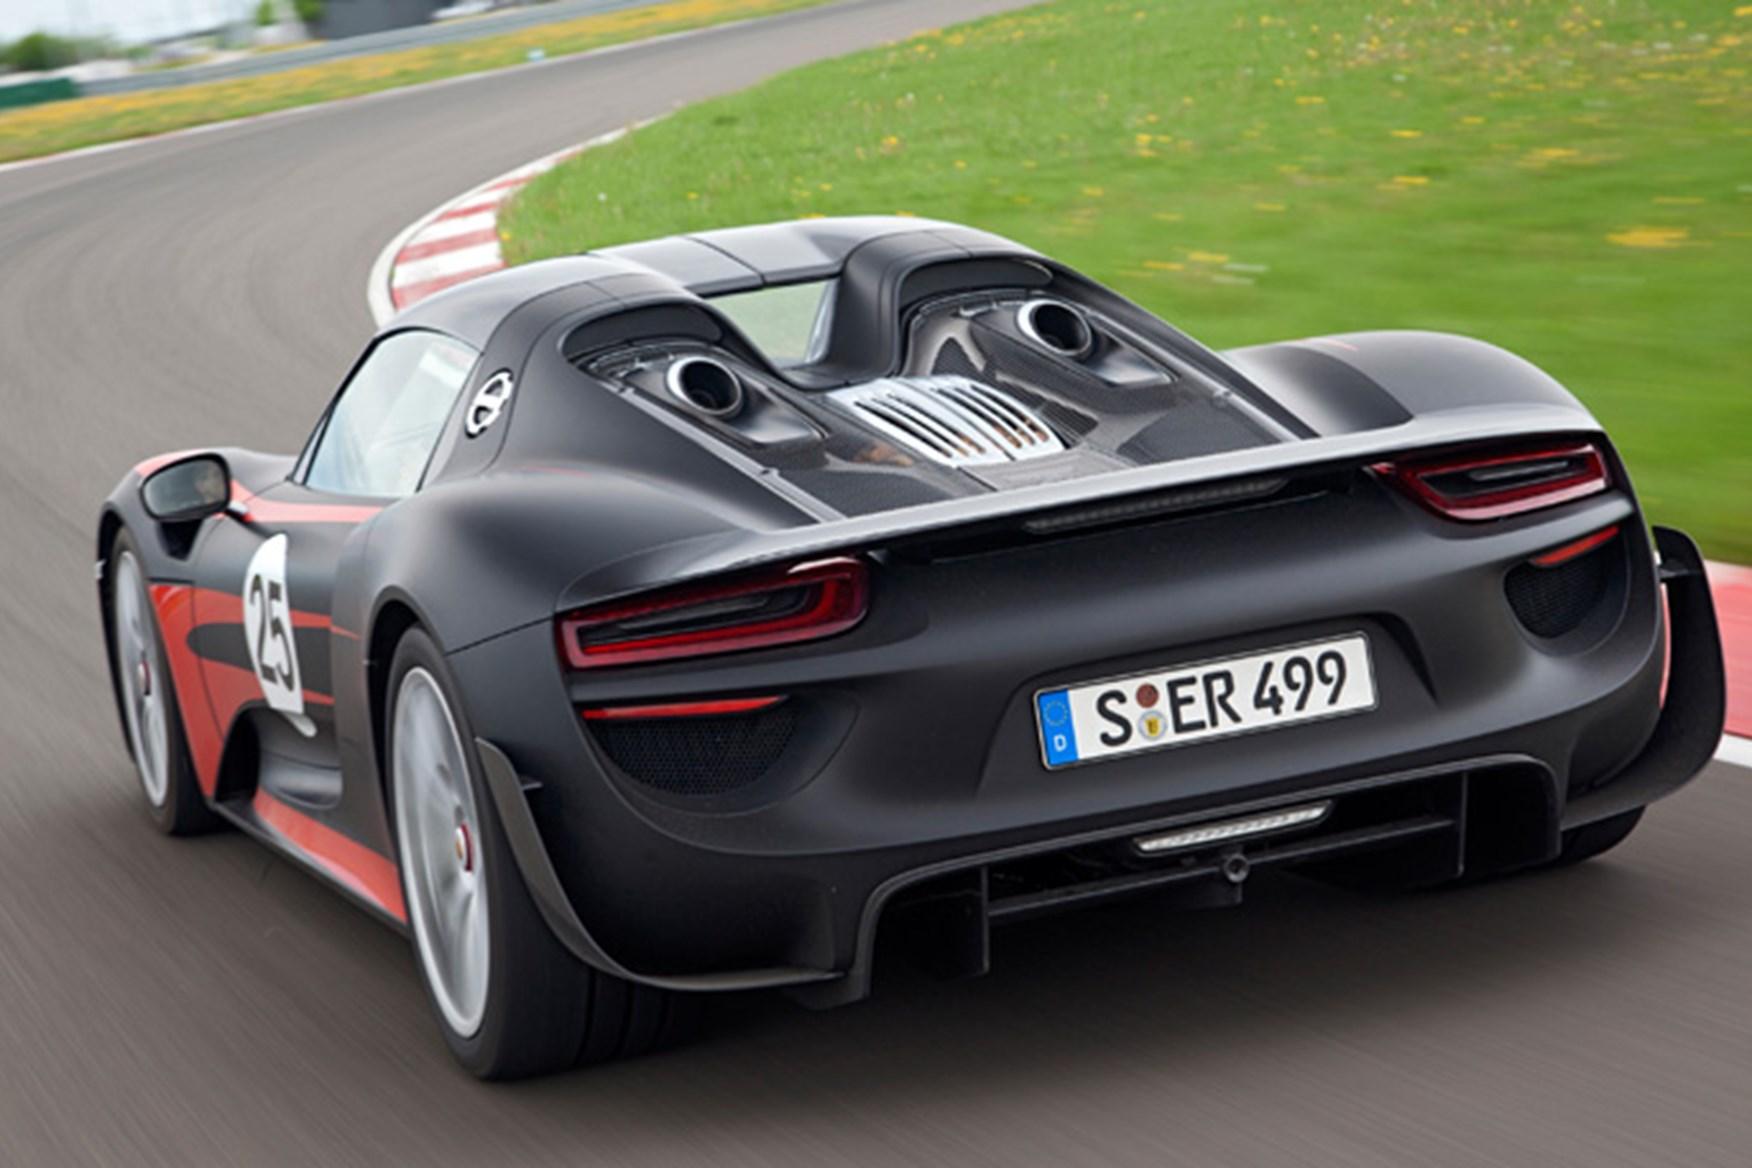 Porsche spyder specs